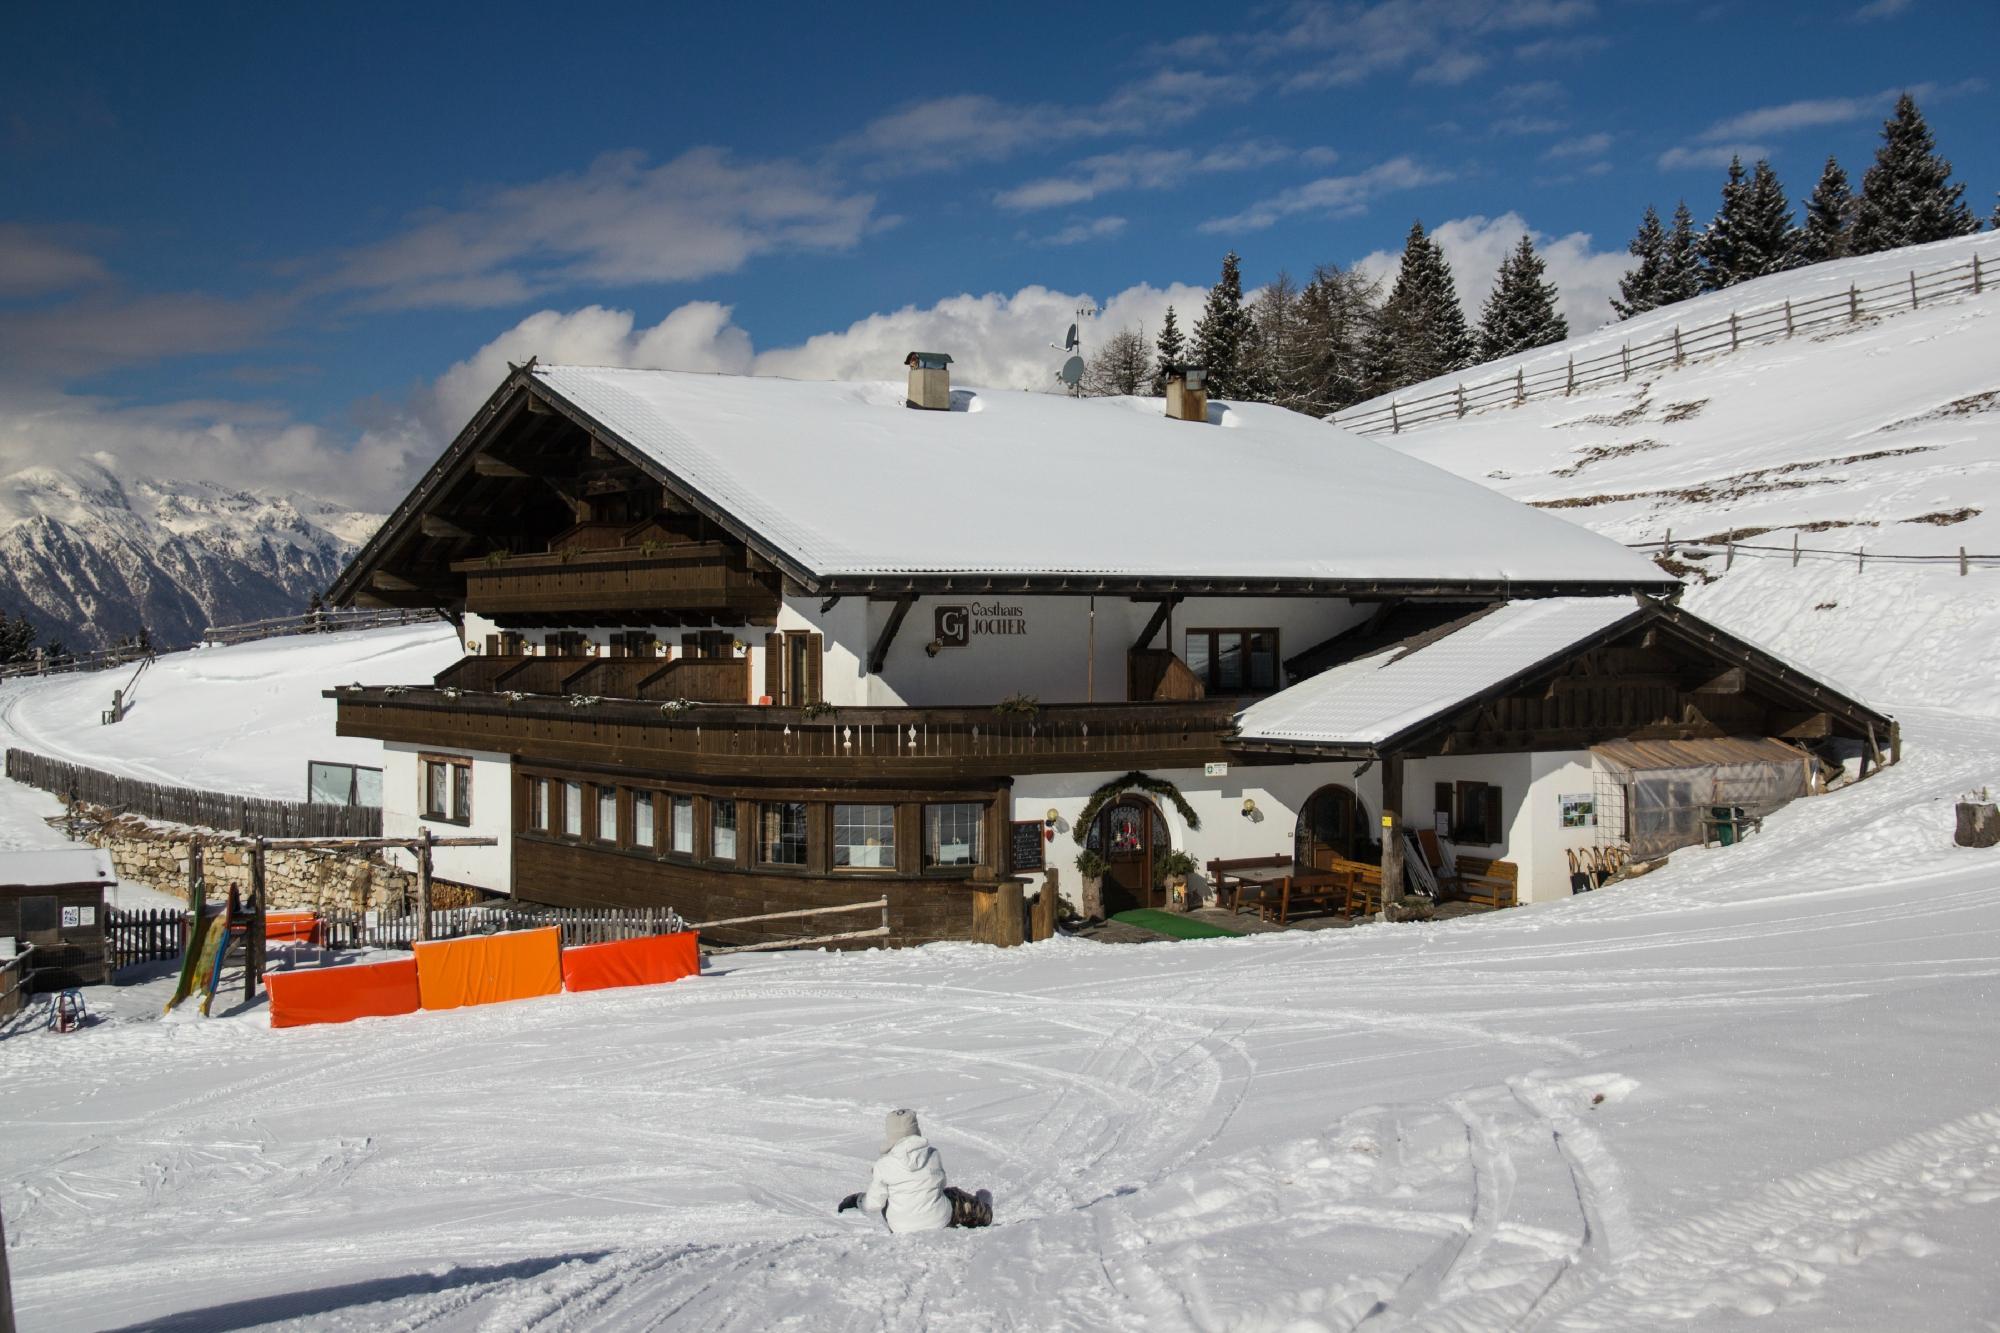 Gasthaus Jocher